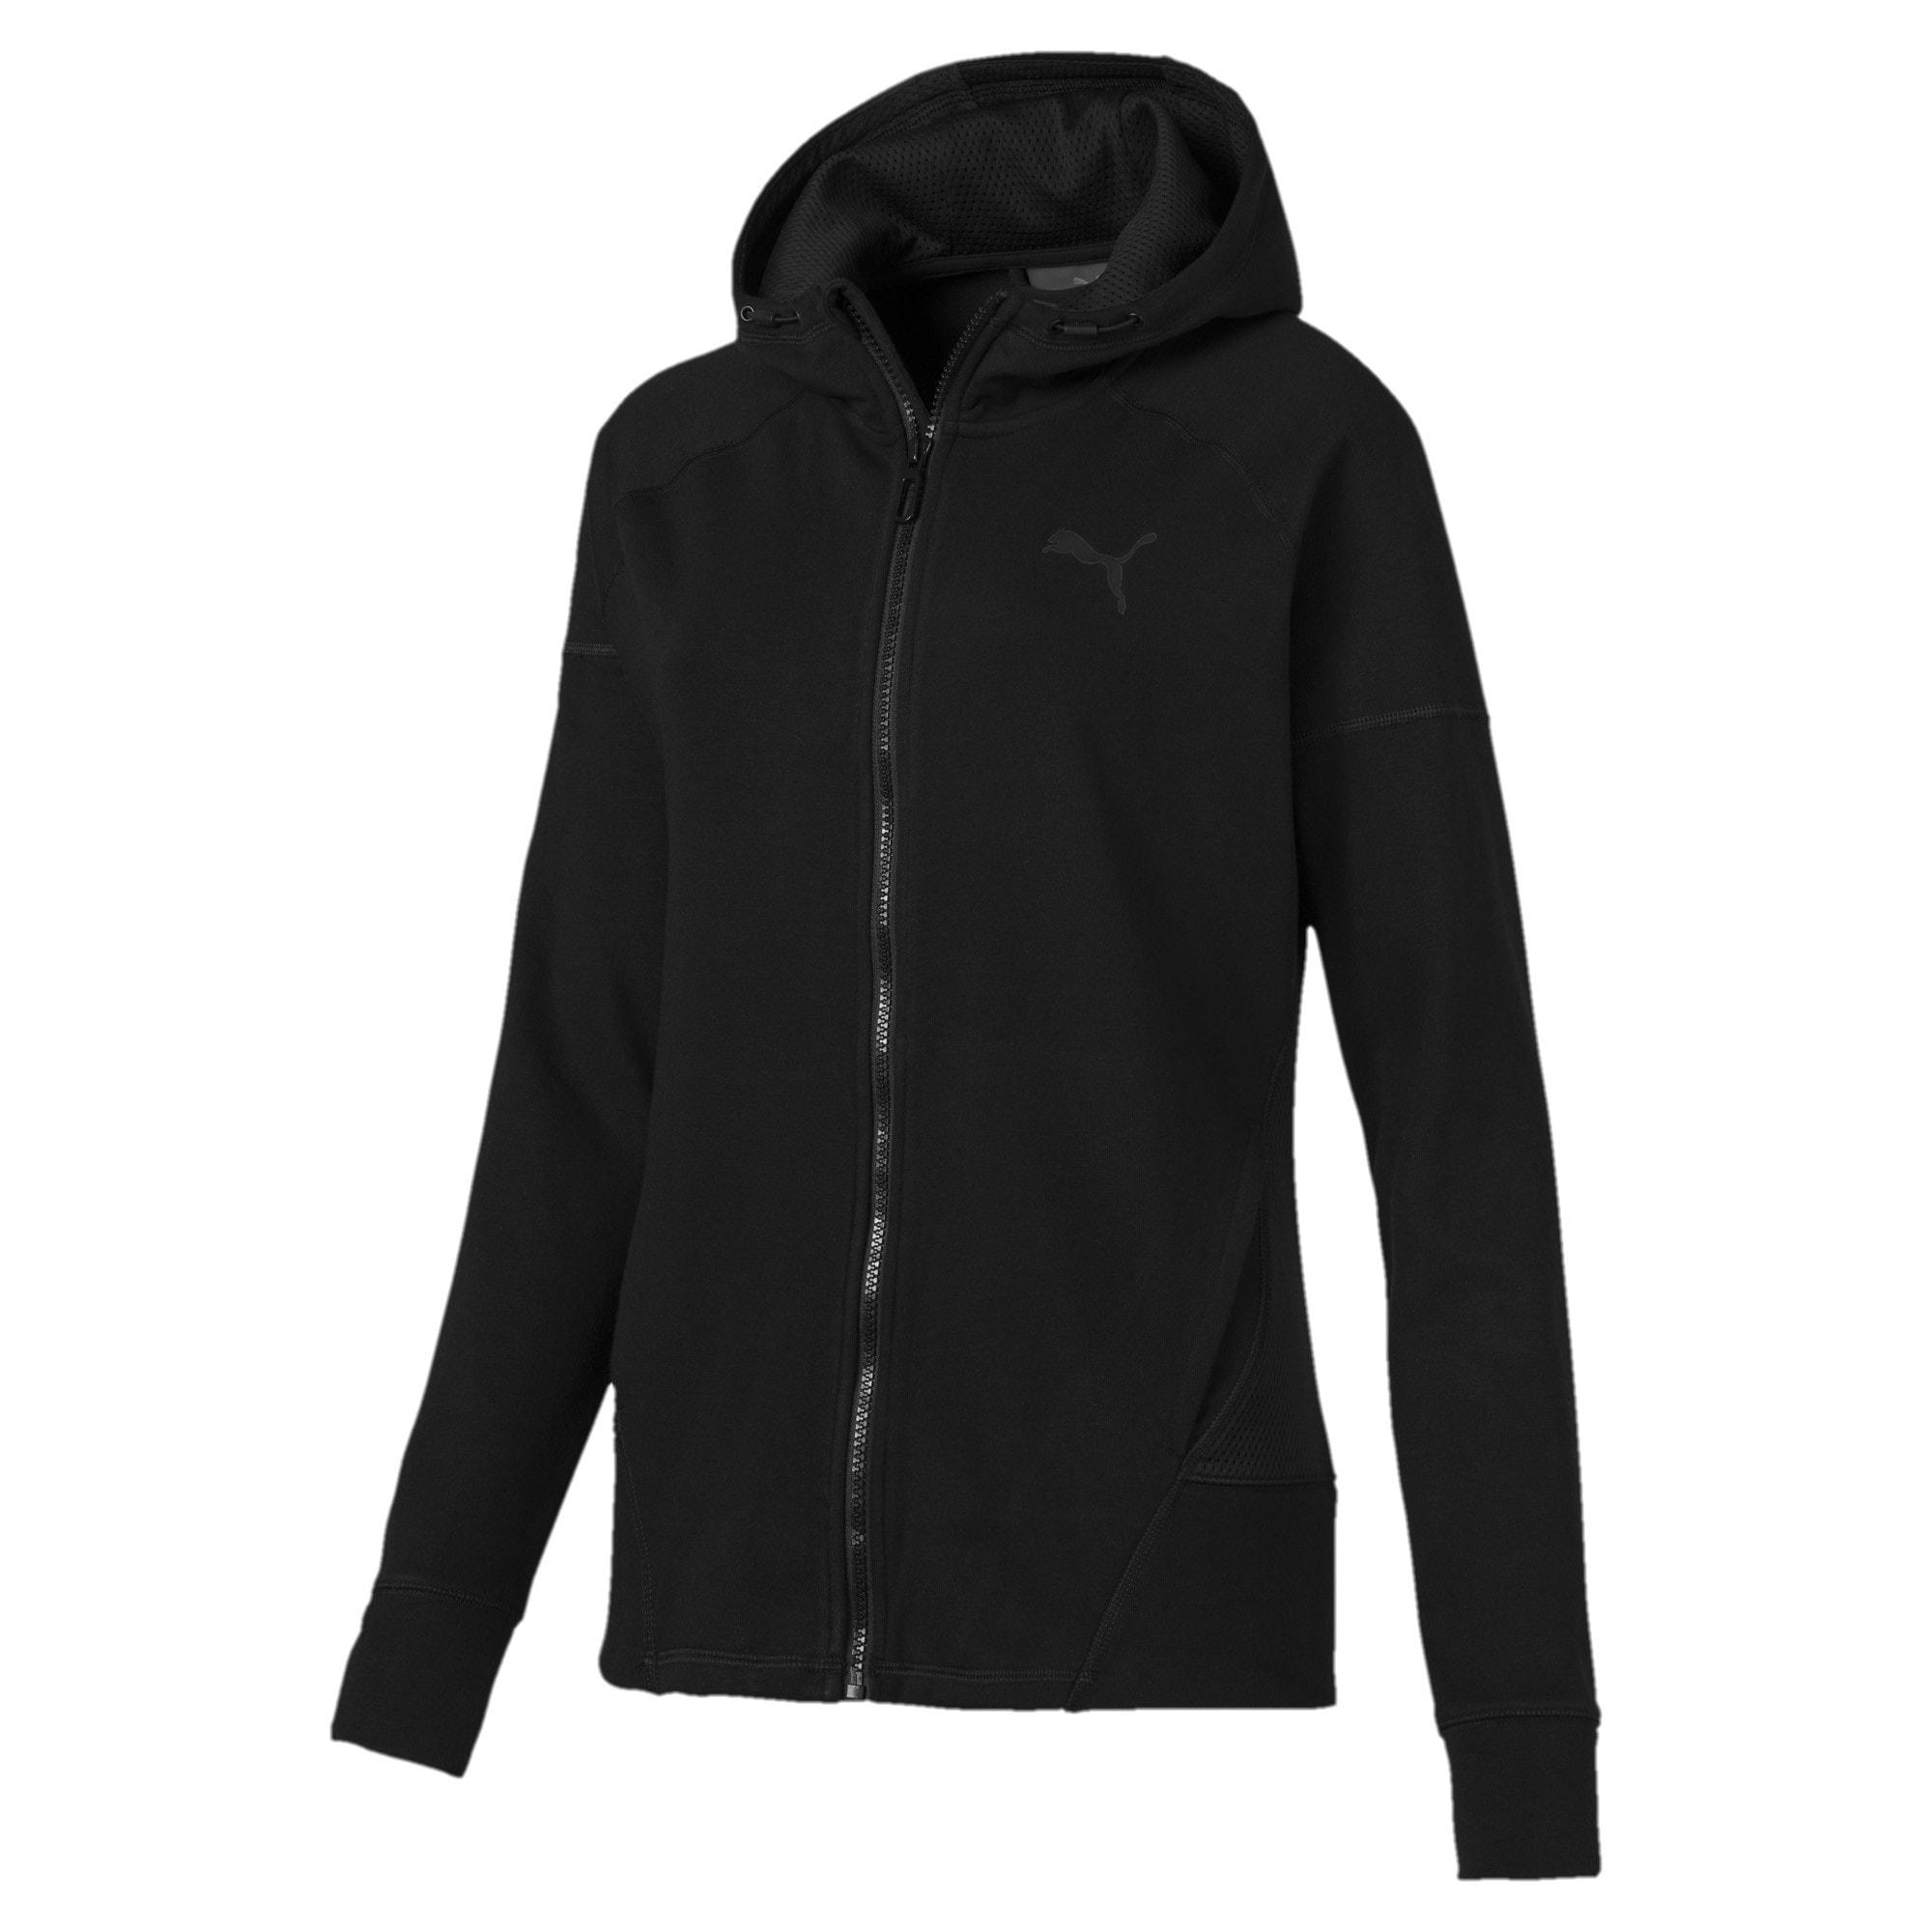 Thumbnail 4 of Yogini Knitted Full Zip Women's Track Jacket, Cotton Black, medium-IND